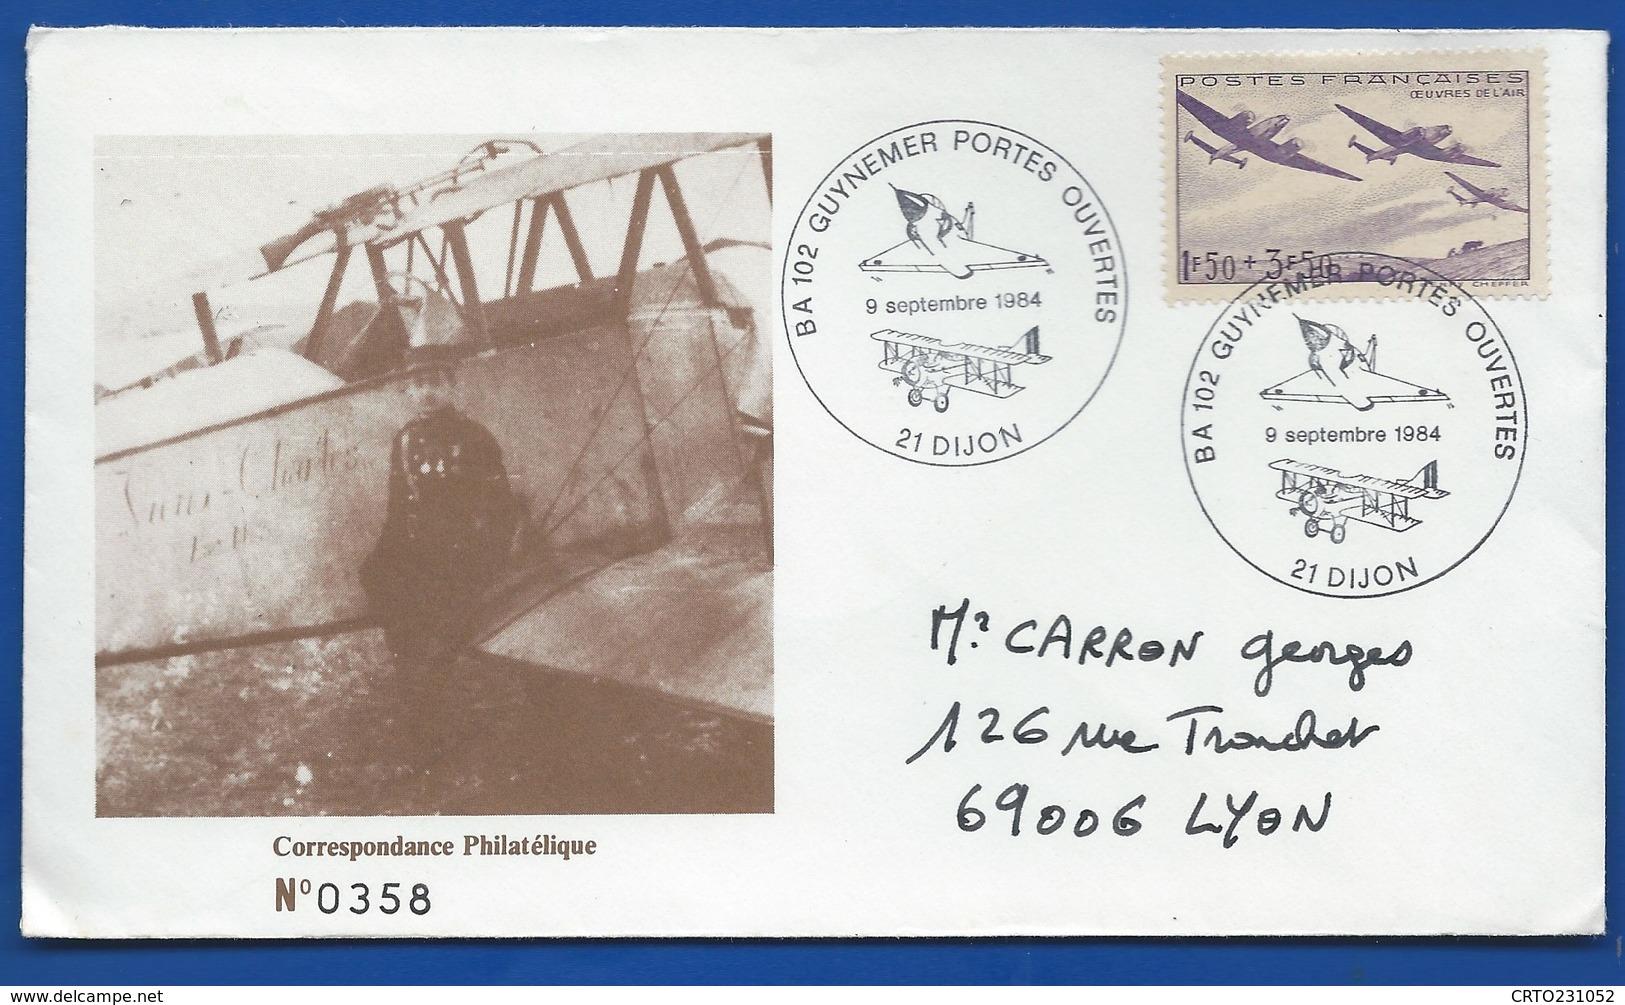 Enveloppe Avec  Timbre N° 540  Oblitération:   BA 102 Guynemer Portes Ouvertes Dijon 9 Septembre 1984 - Marcophilie (Lettres)